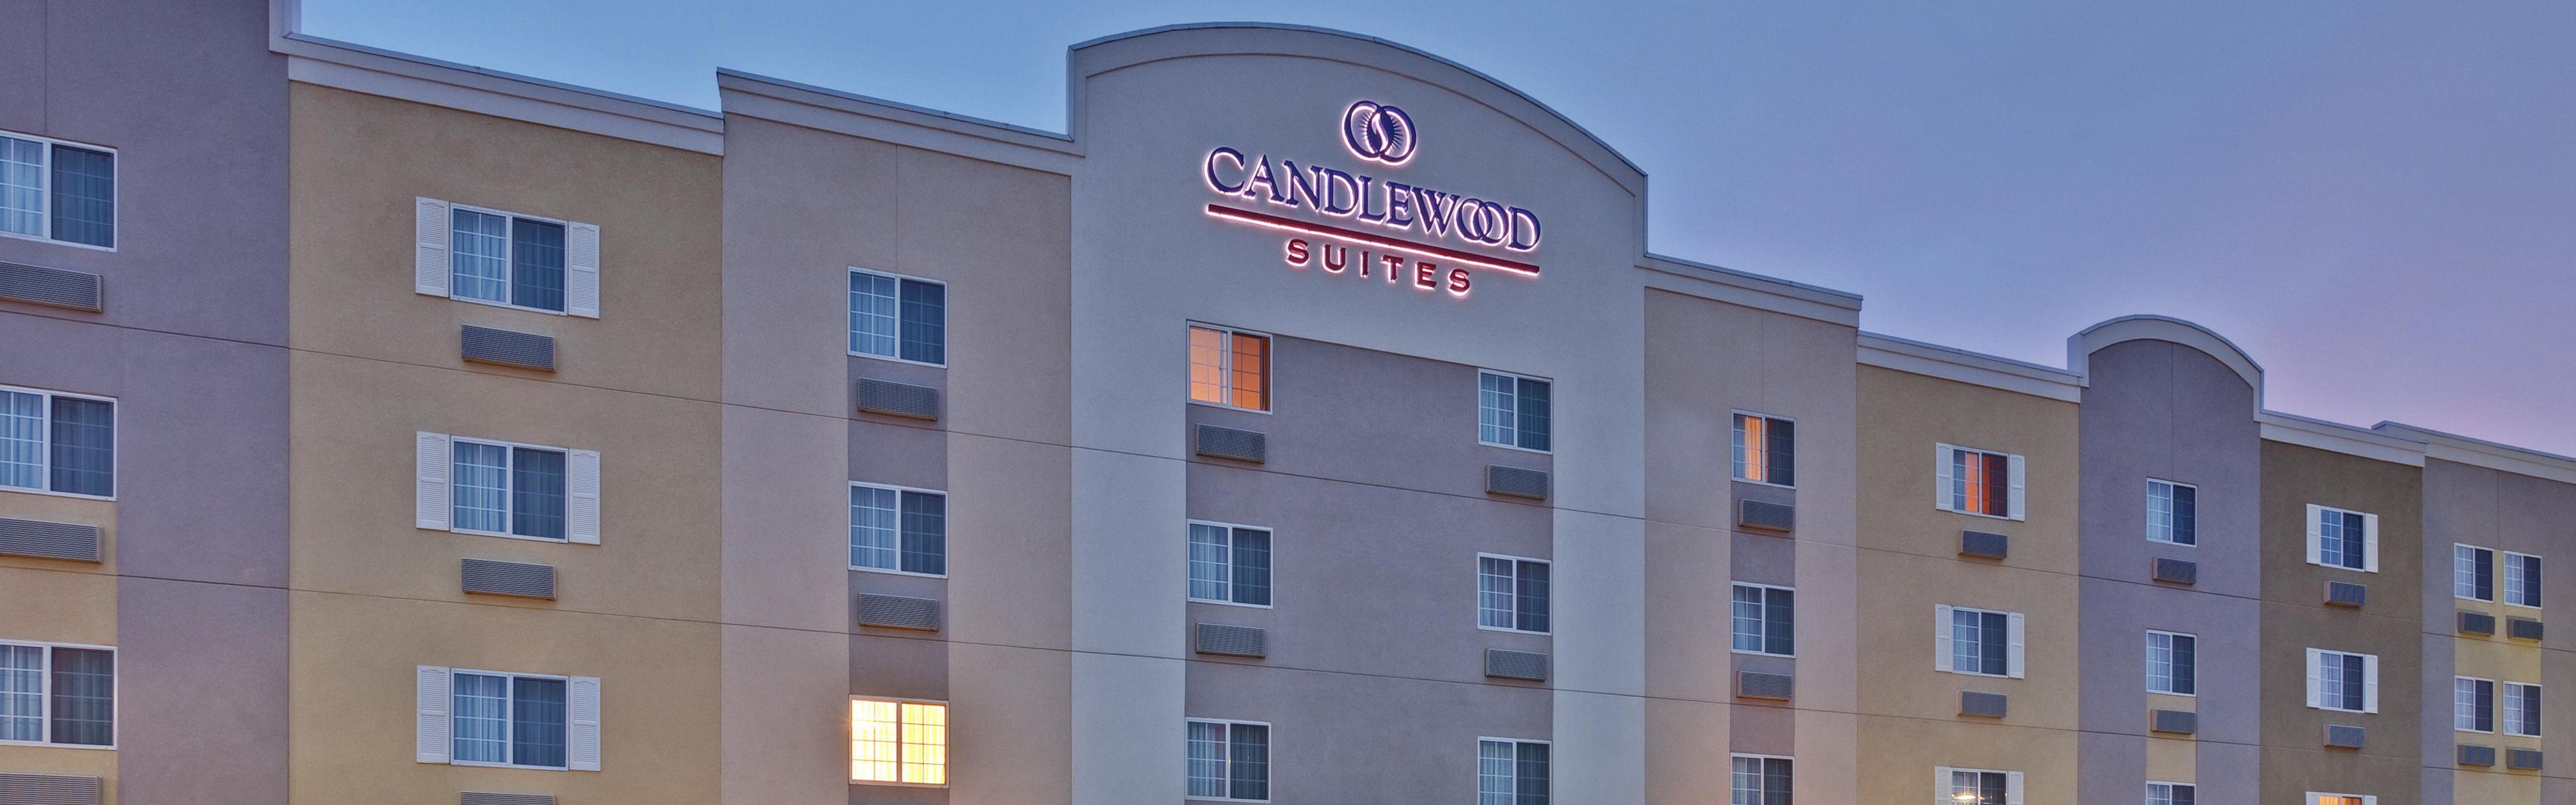 Candlewood Suites Paducah image 0